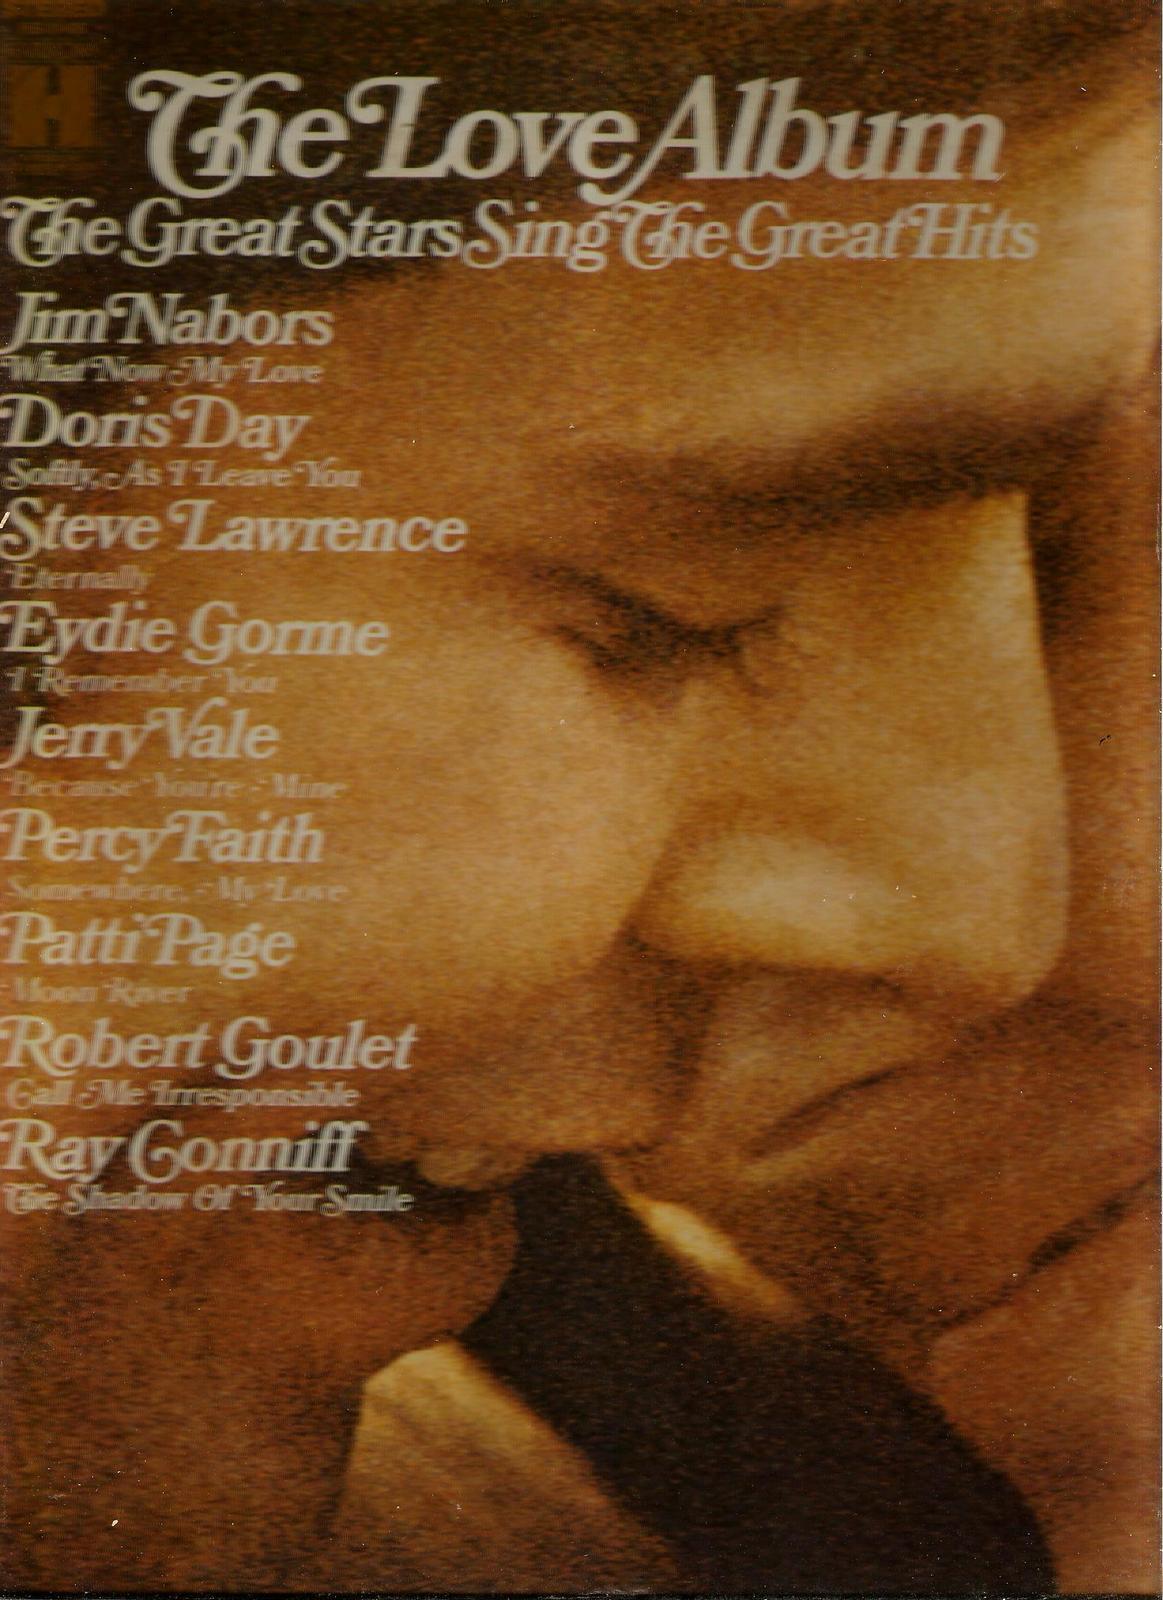 THE  LOVE  ALBUM  * ROBERT GOULET ~ JERRY VALE ~ DORIS DAY * more  LP STEREO